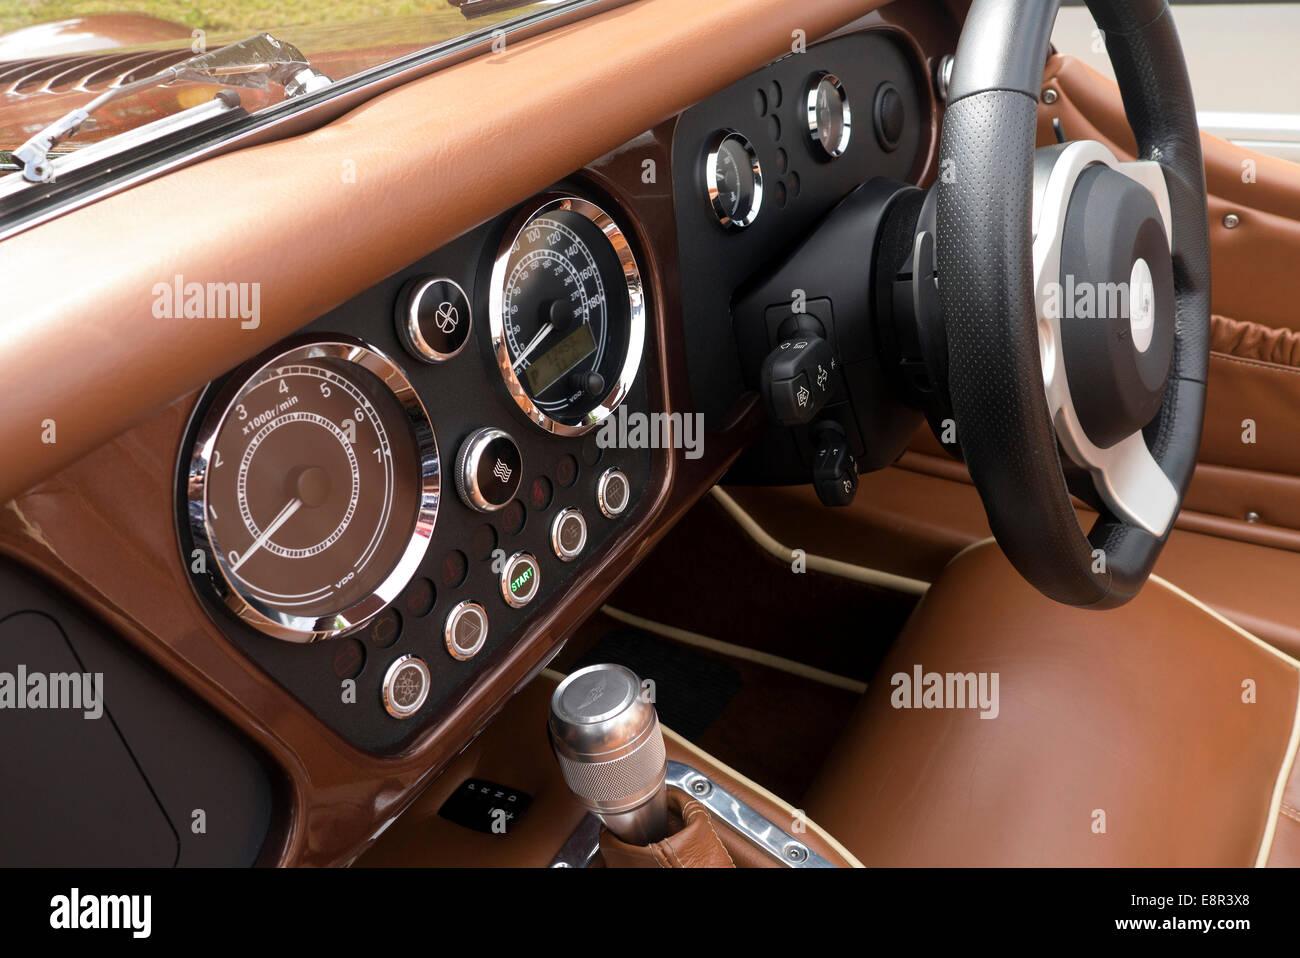 2014 Morgan Plus 8 Interieur und Armaturenbrett Stockfoto, Bild ...